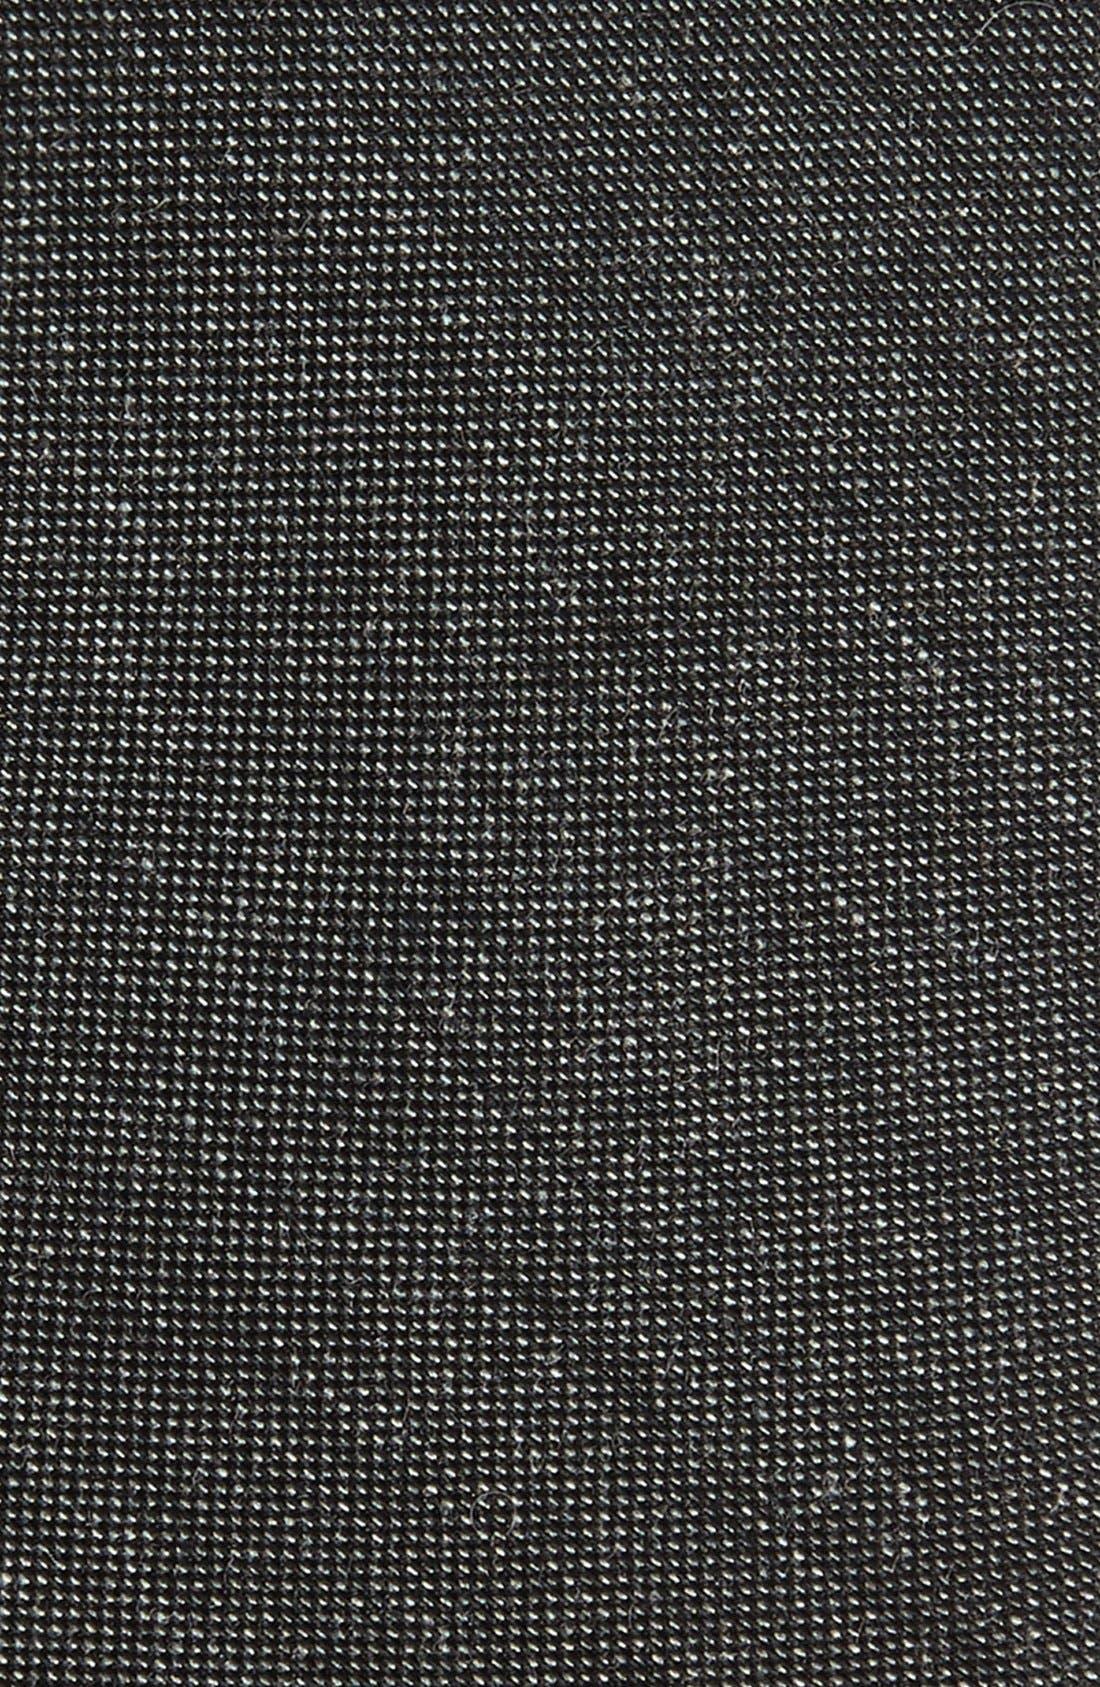 Mélange Woven Skinny Tie,                             Alternate thumbnail 2, color,                             015